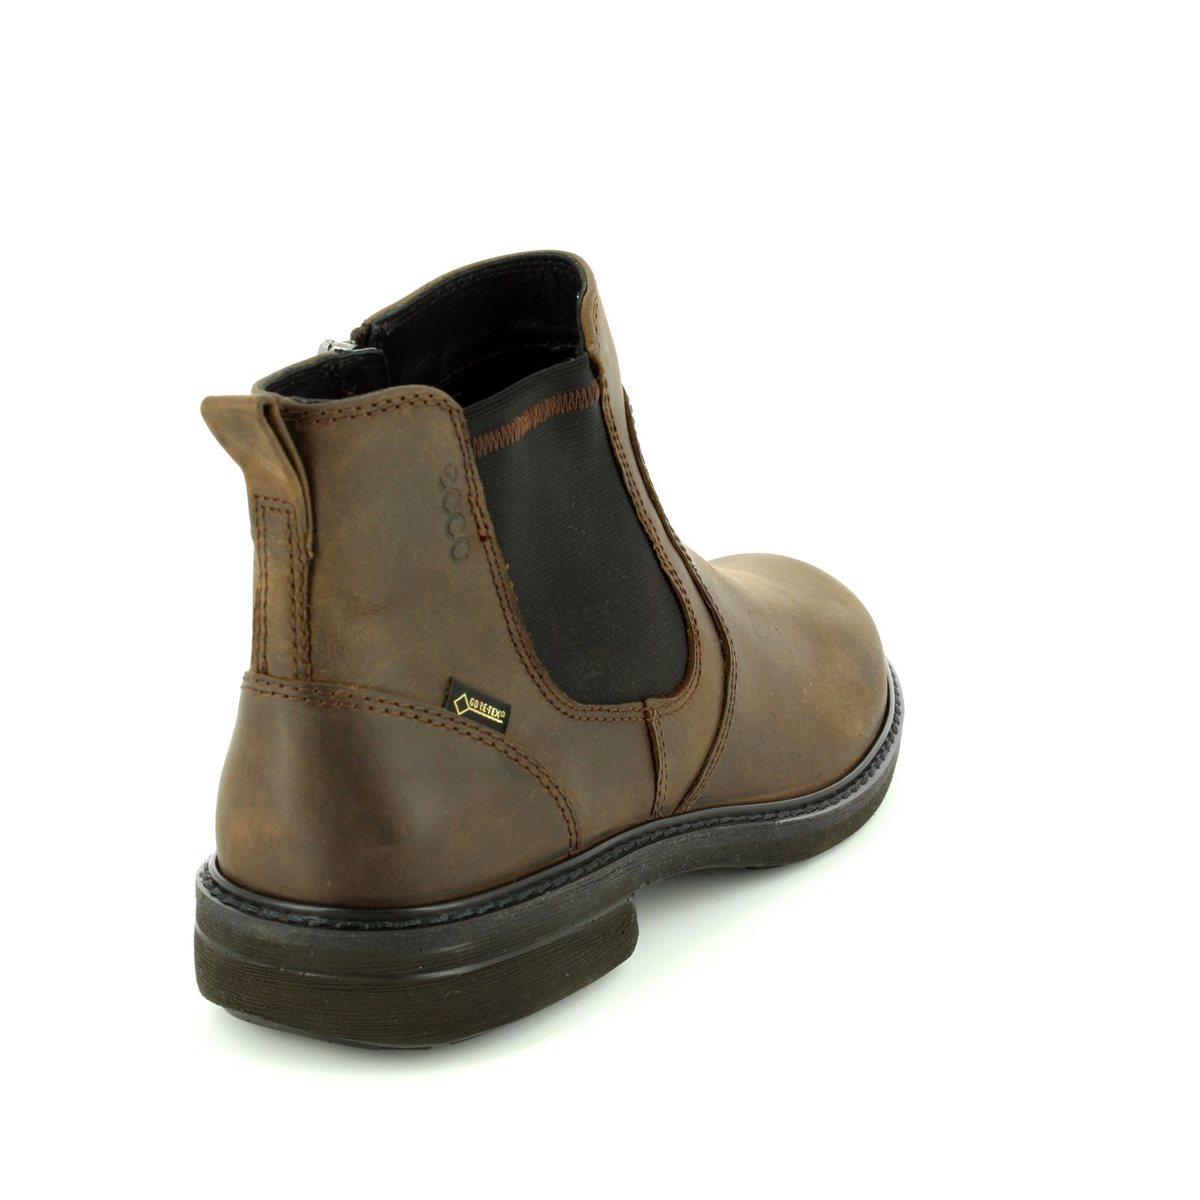 c003fff3ef7b ECCO Boots - Brown nubuck - 510214 02482 TURN GORE-TEX